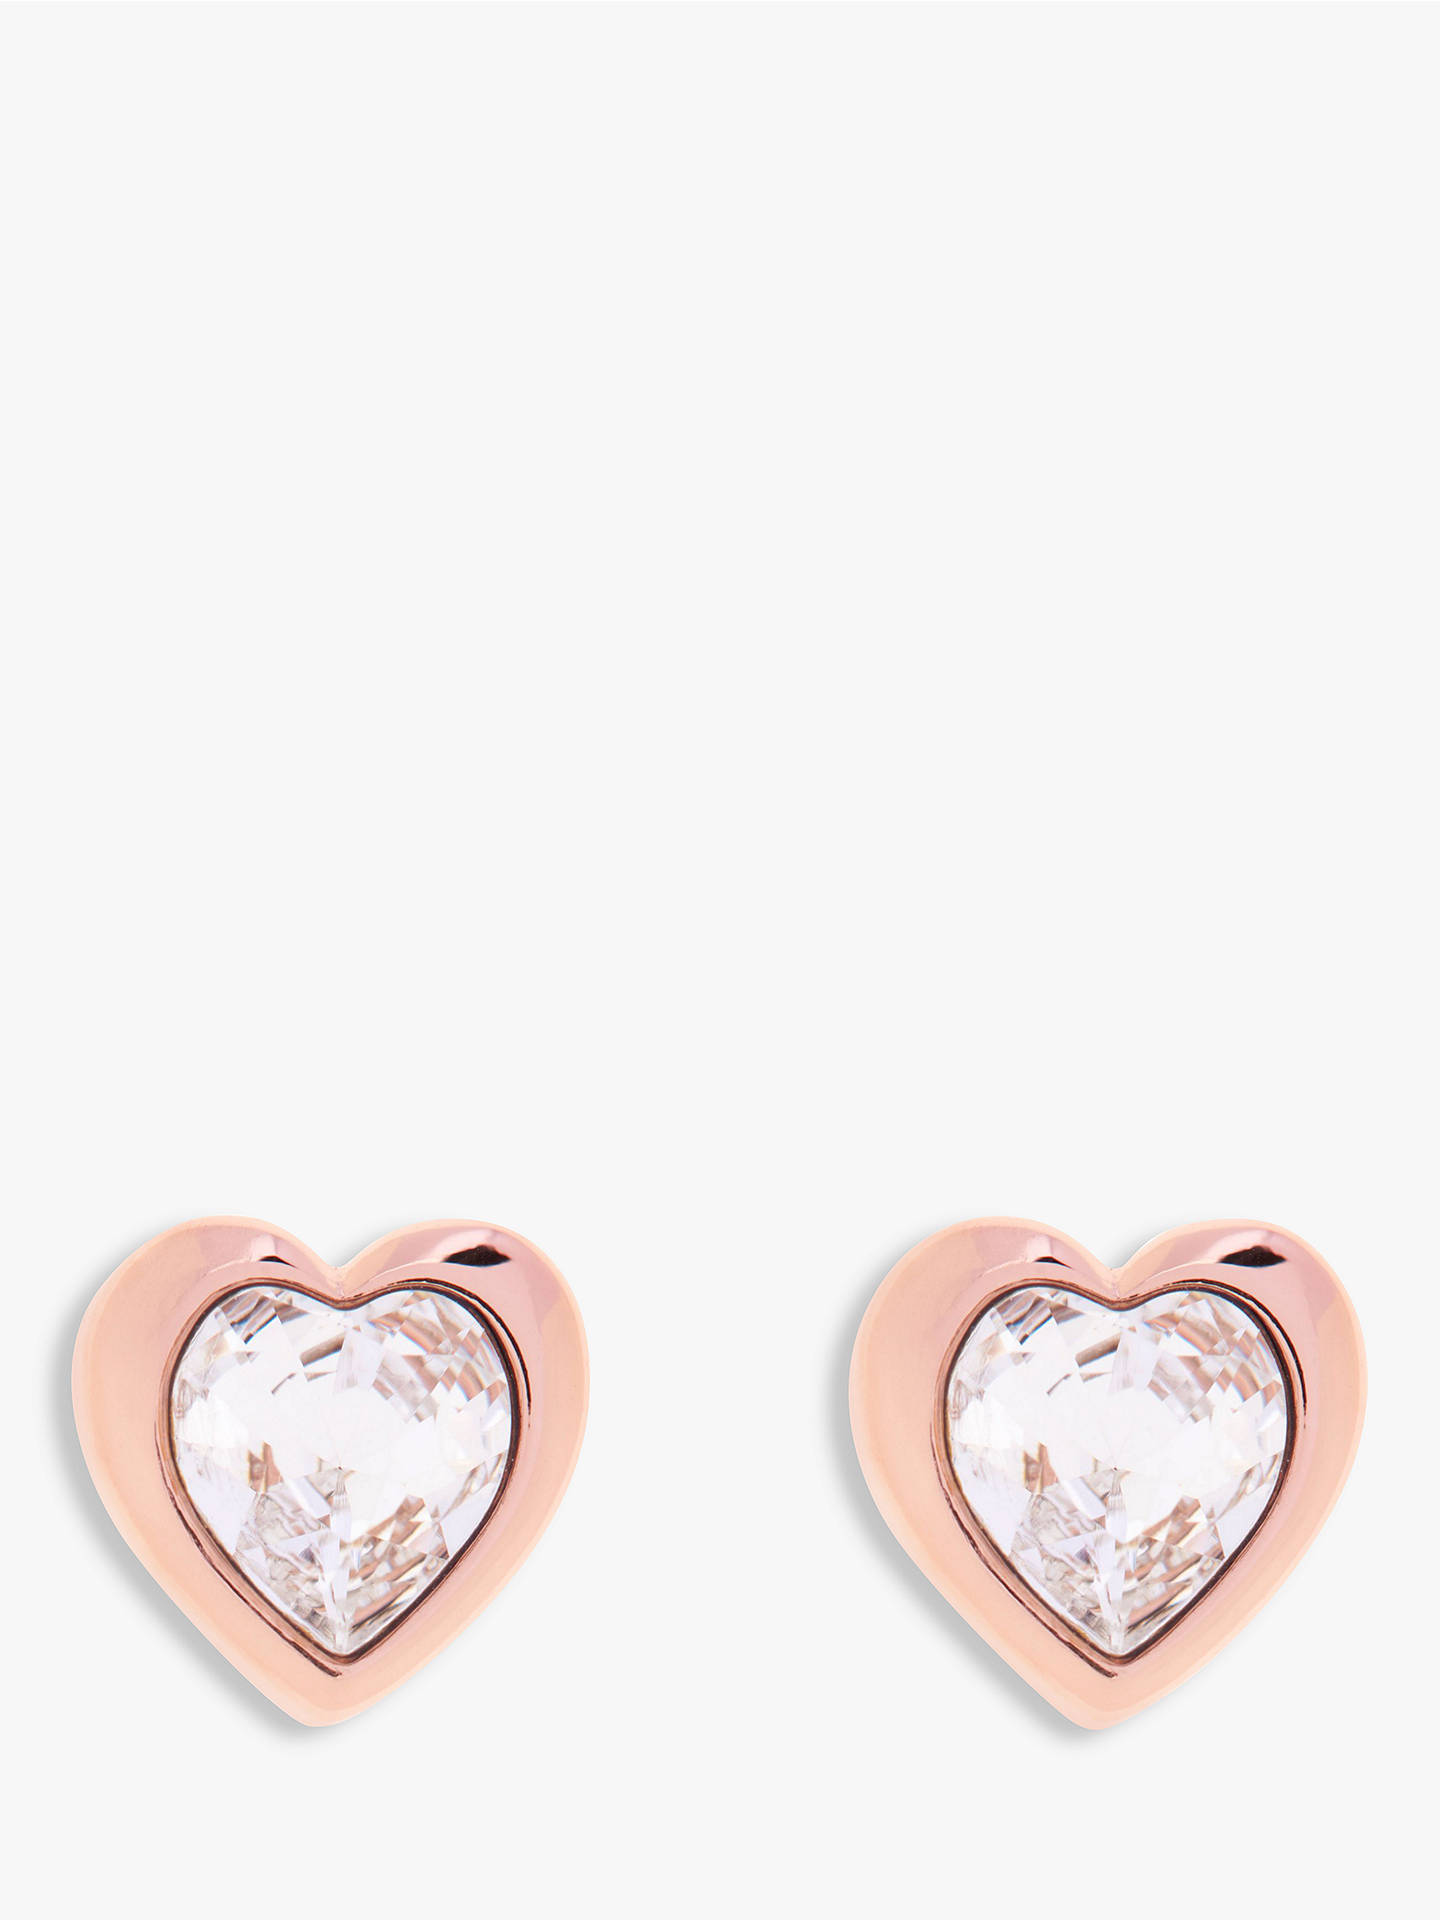 46aa1c0ee969 Ted Baker Hanella Swarovski Crystal Heart Stud Earrings at John ...